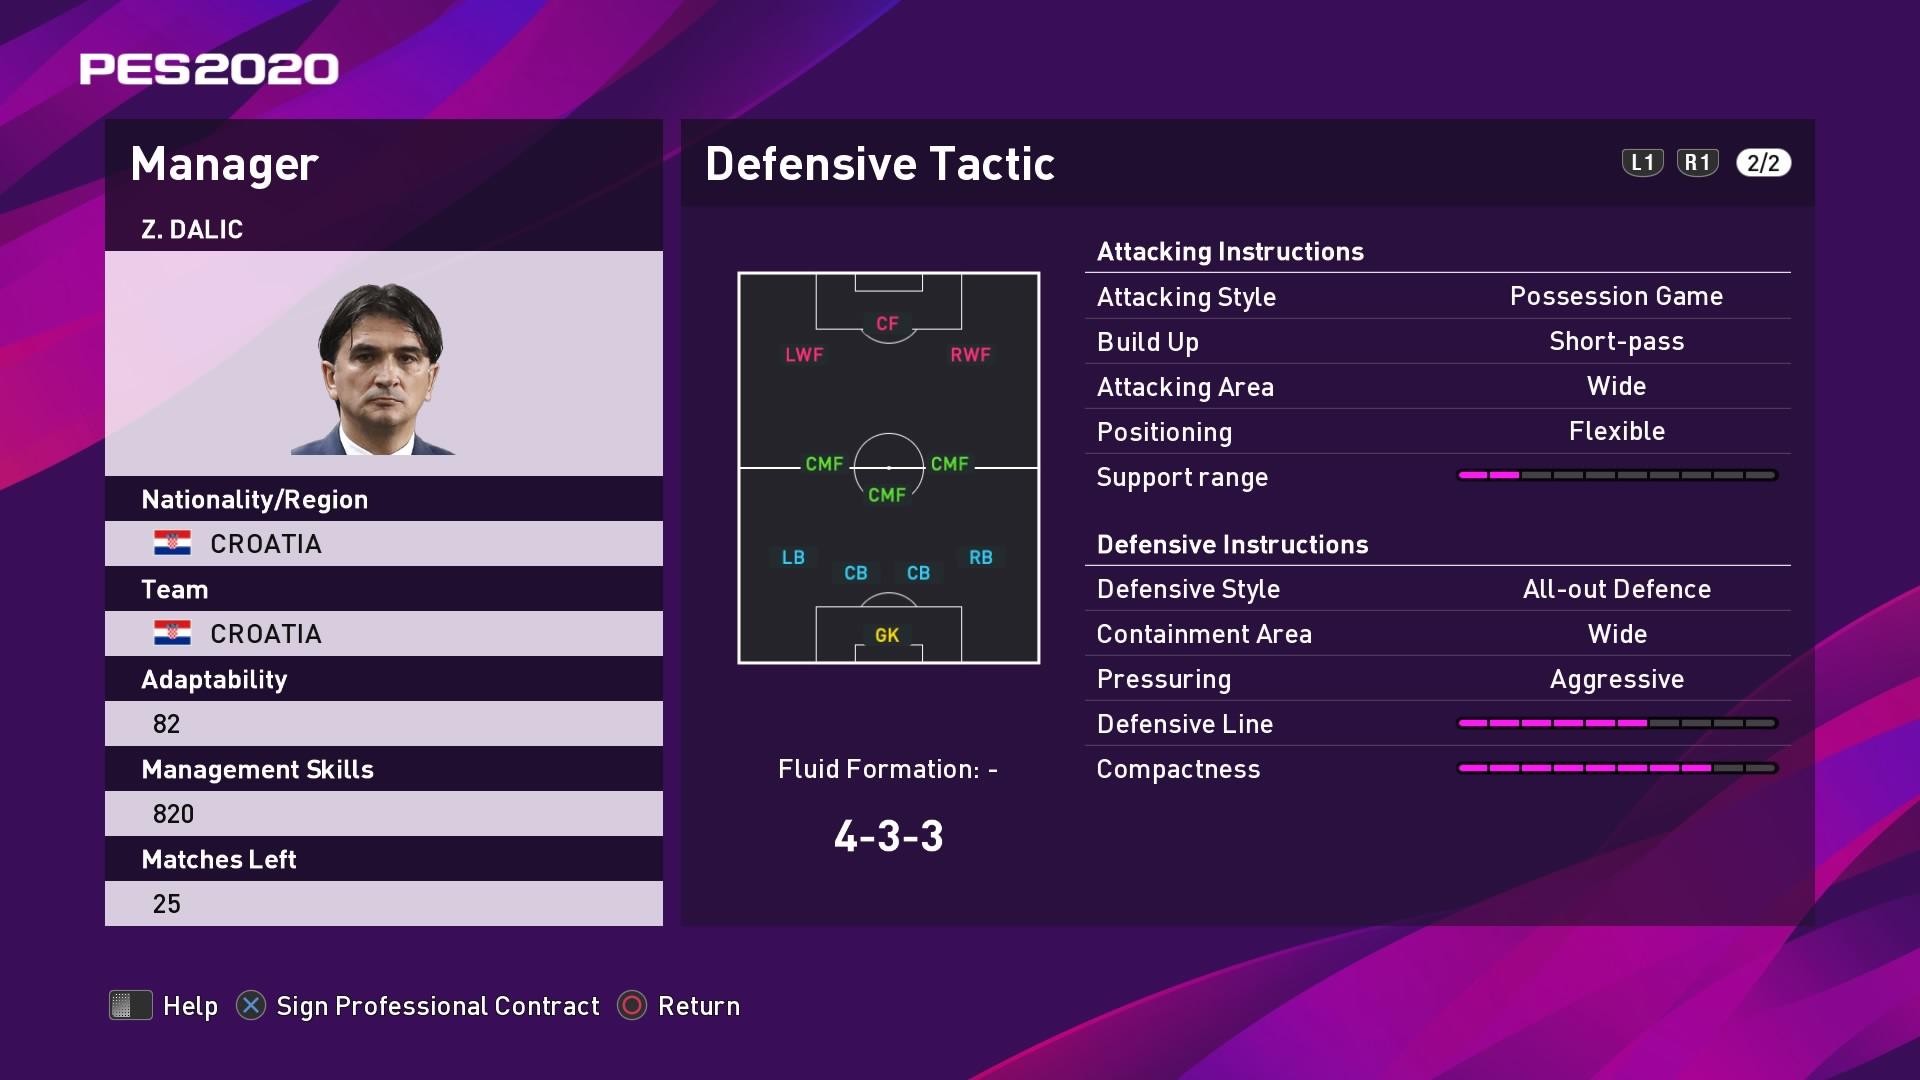 Z. Dalic (2) (Zlatko Dalić) Defensive Tactic in PES 2020 myClub